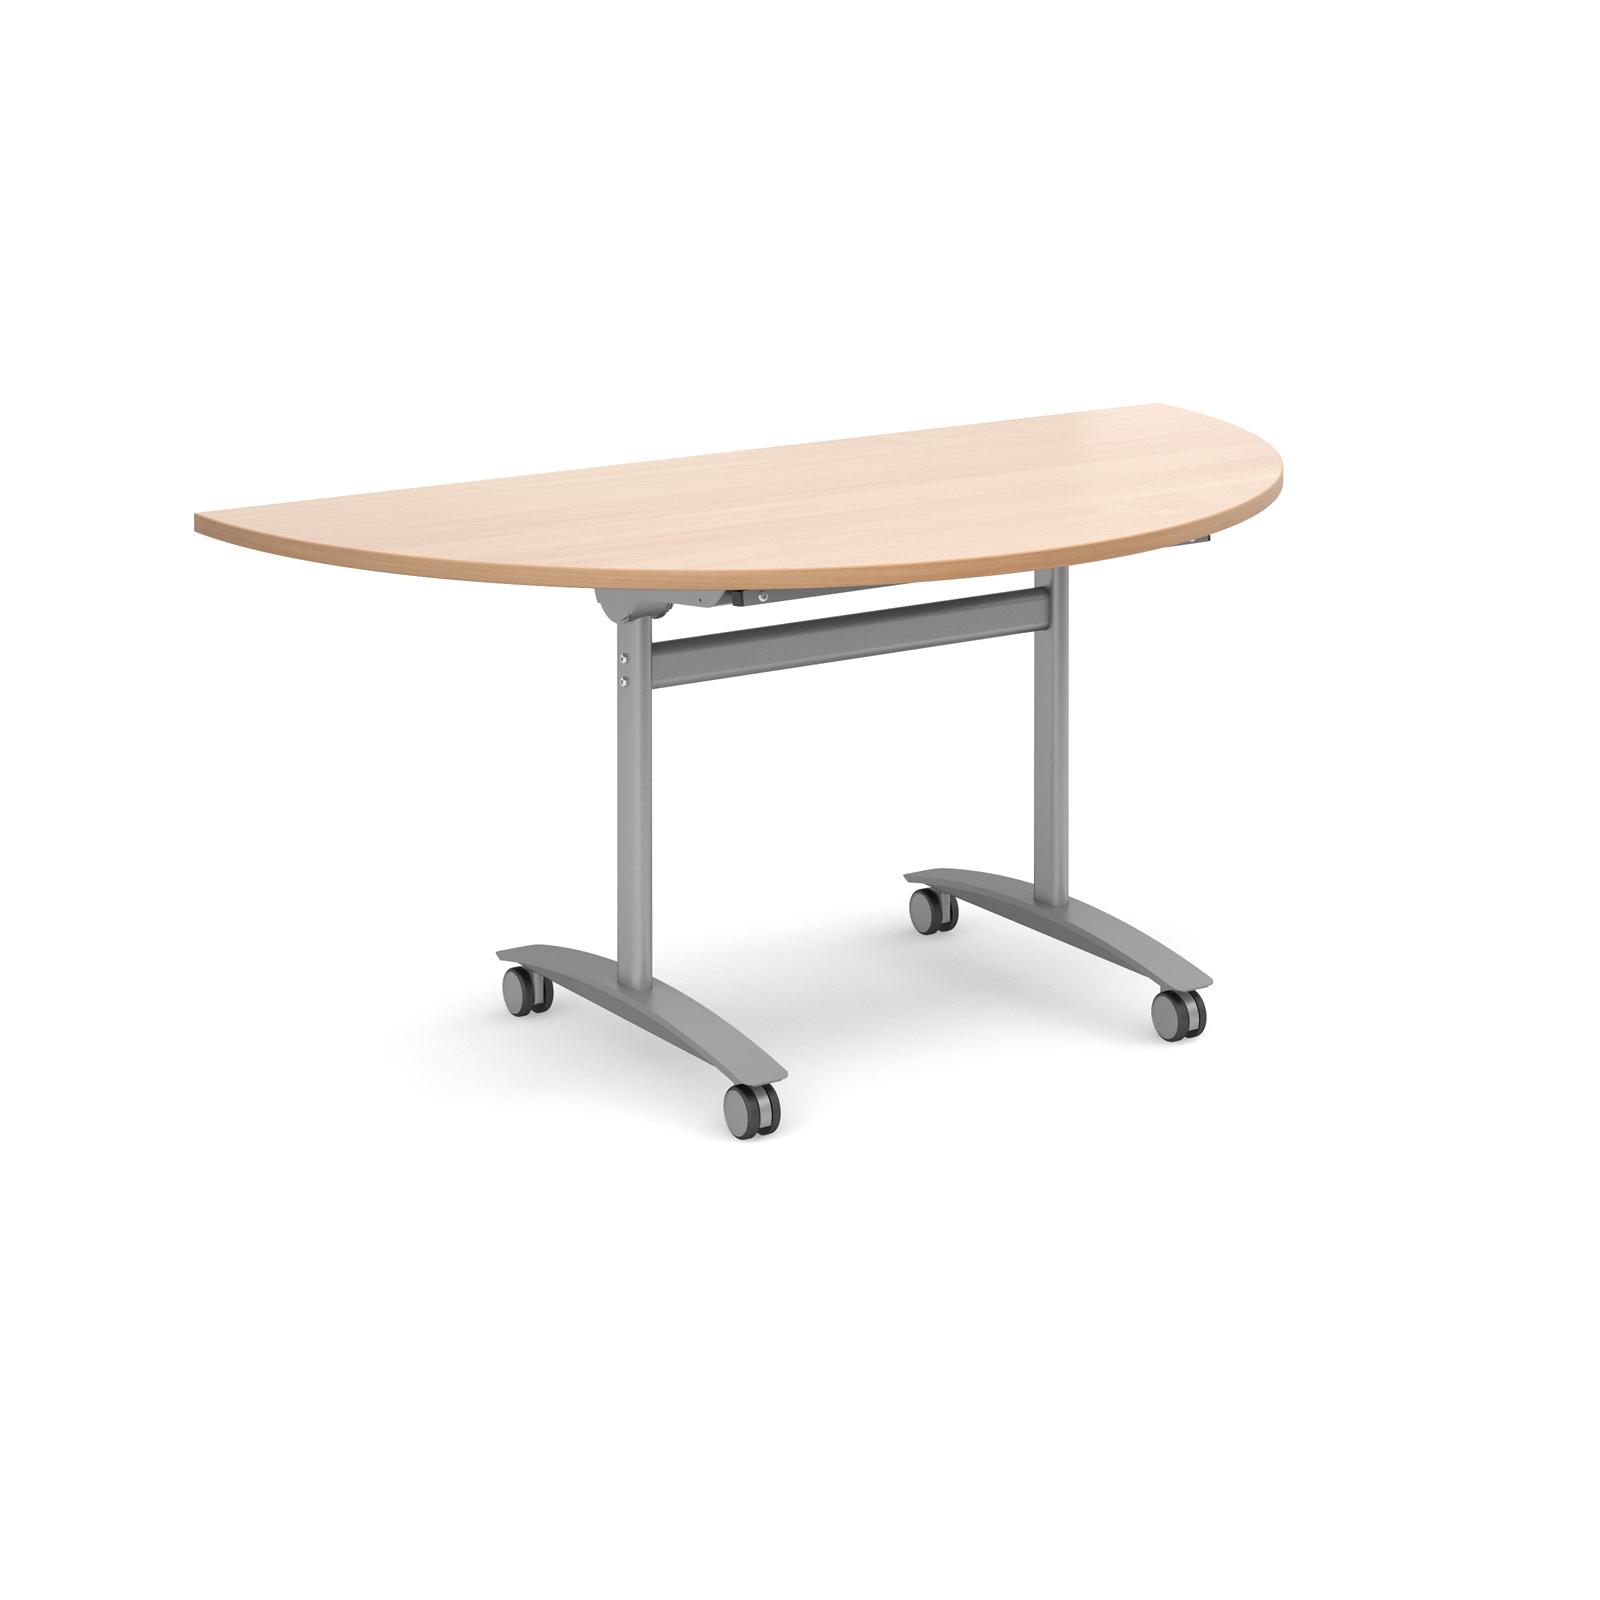 Semi Circular Fliptop Meeting Table